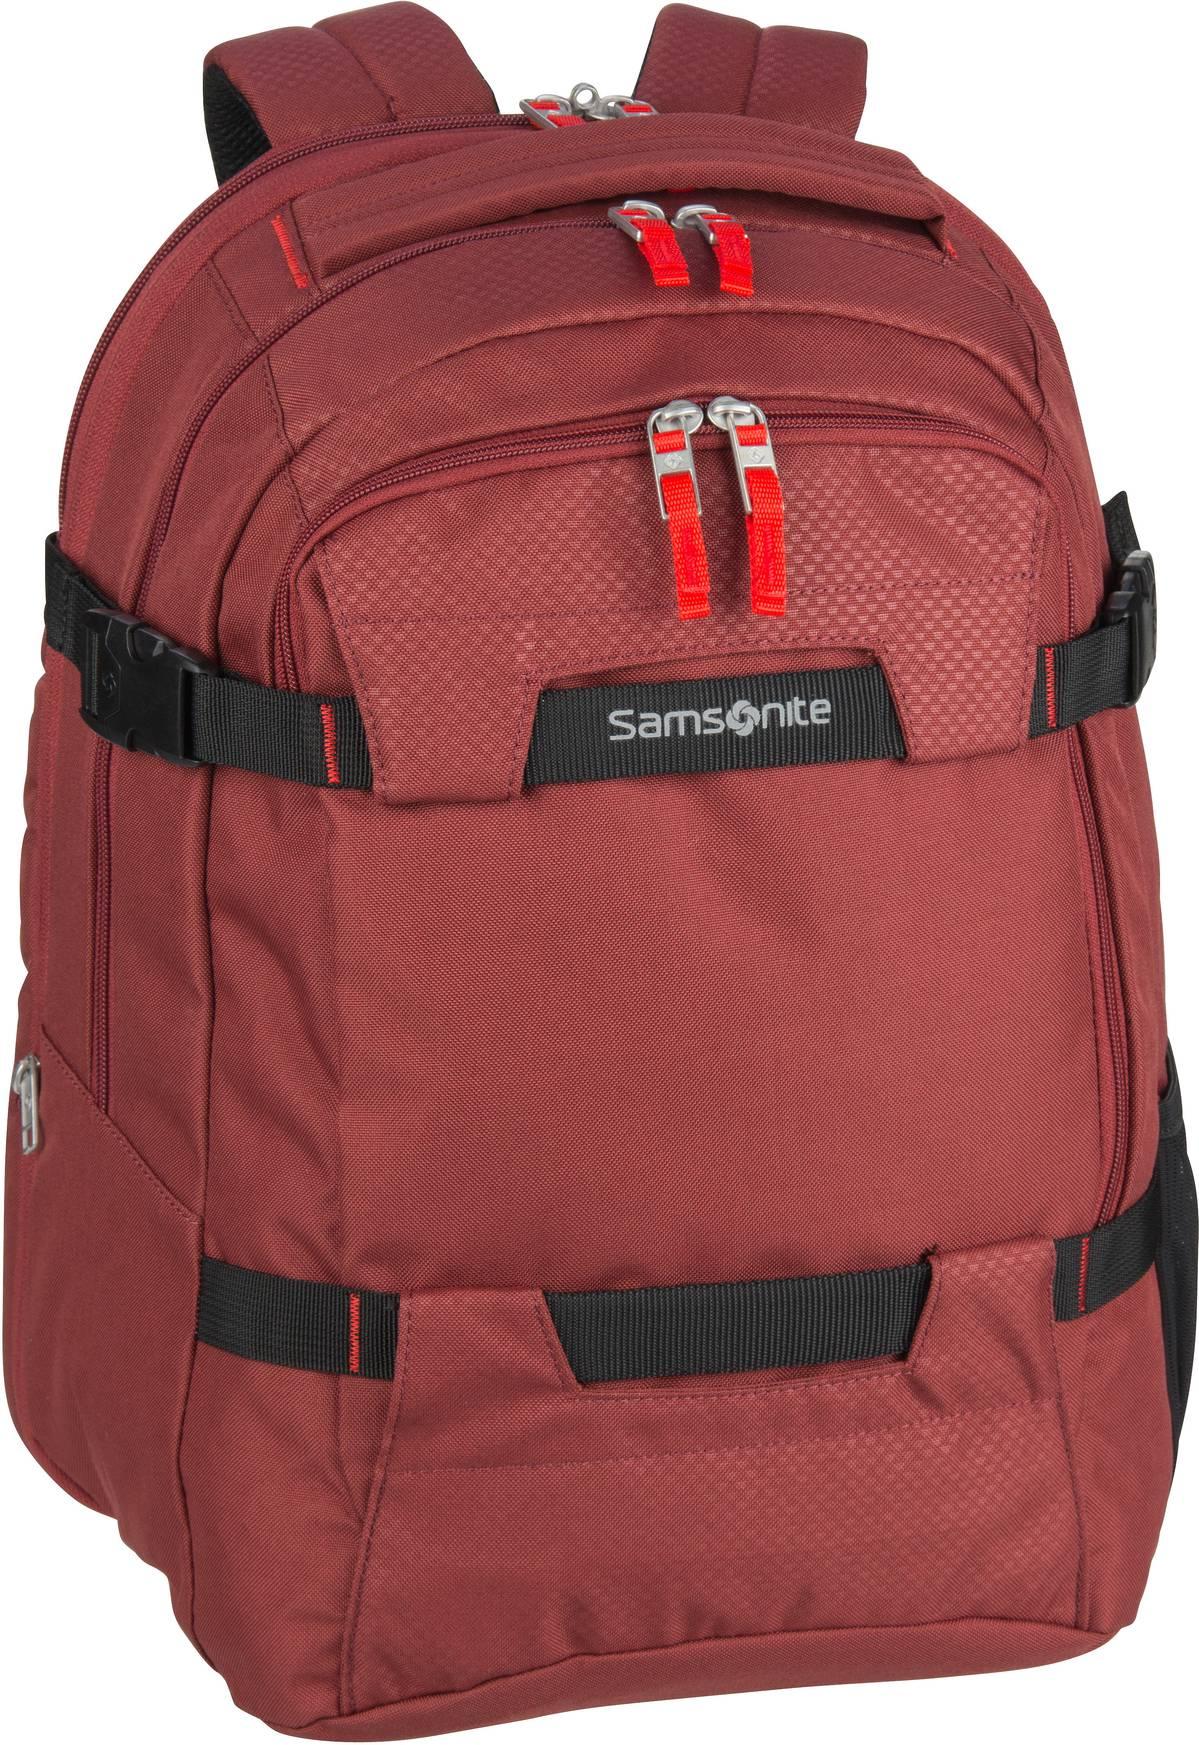 Rucksack / Daypack Sonora Laptop Backpack L exp Barn Red (31 Liter)